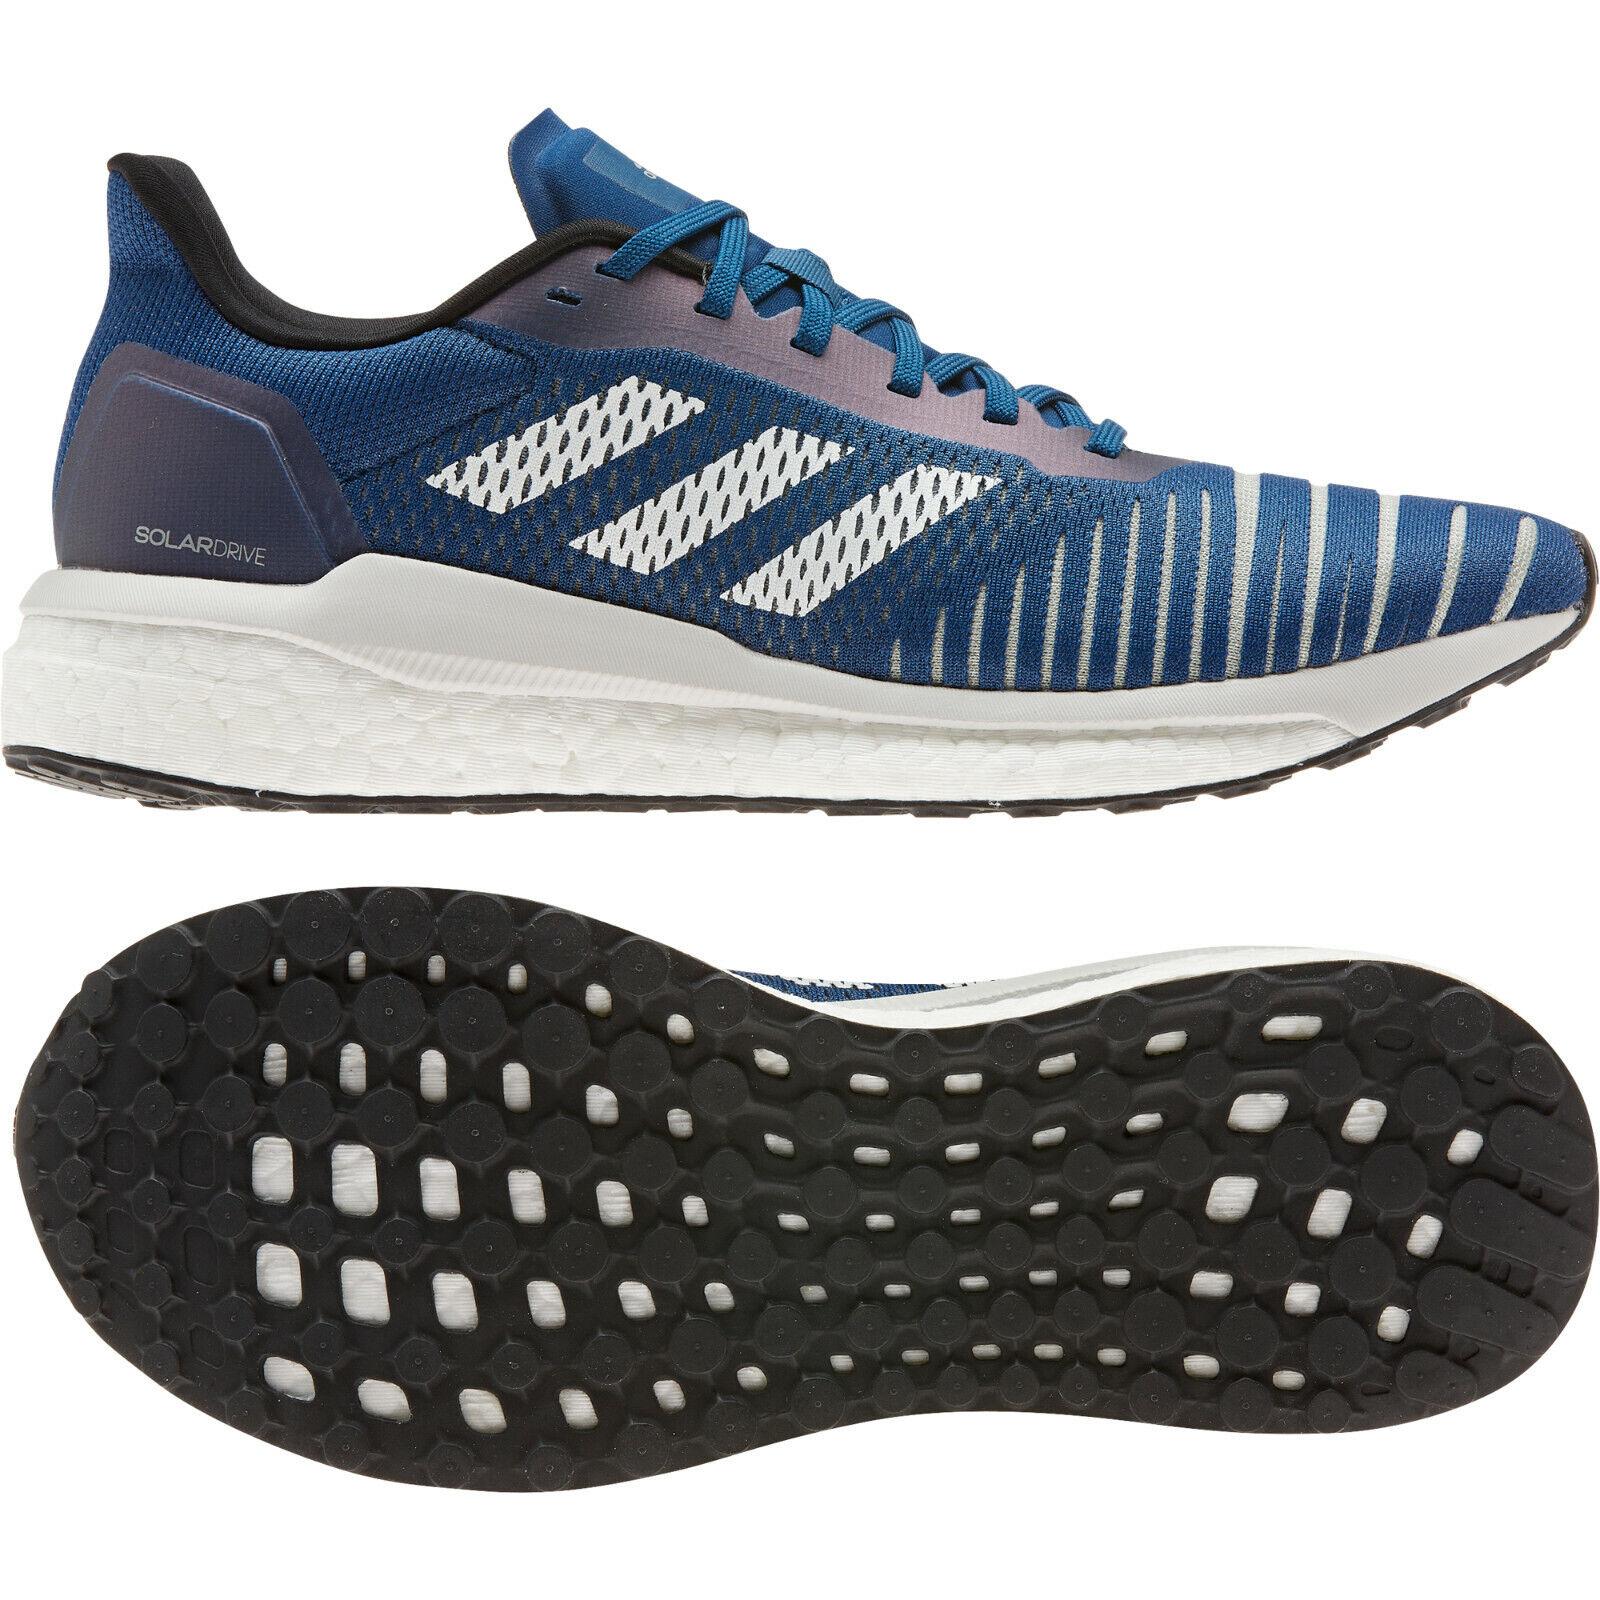 adidas solar stivali sports scarpe